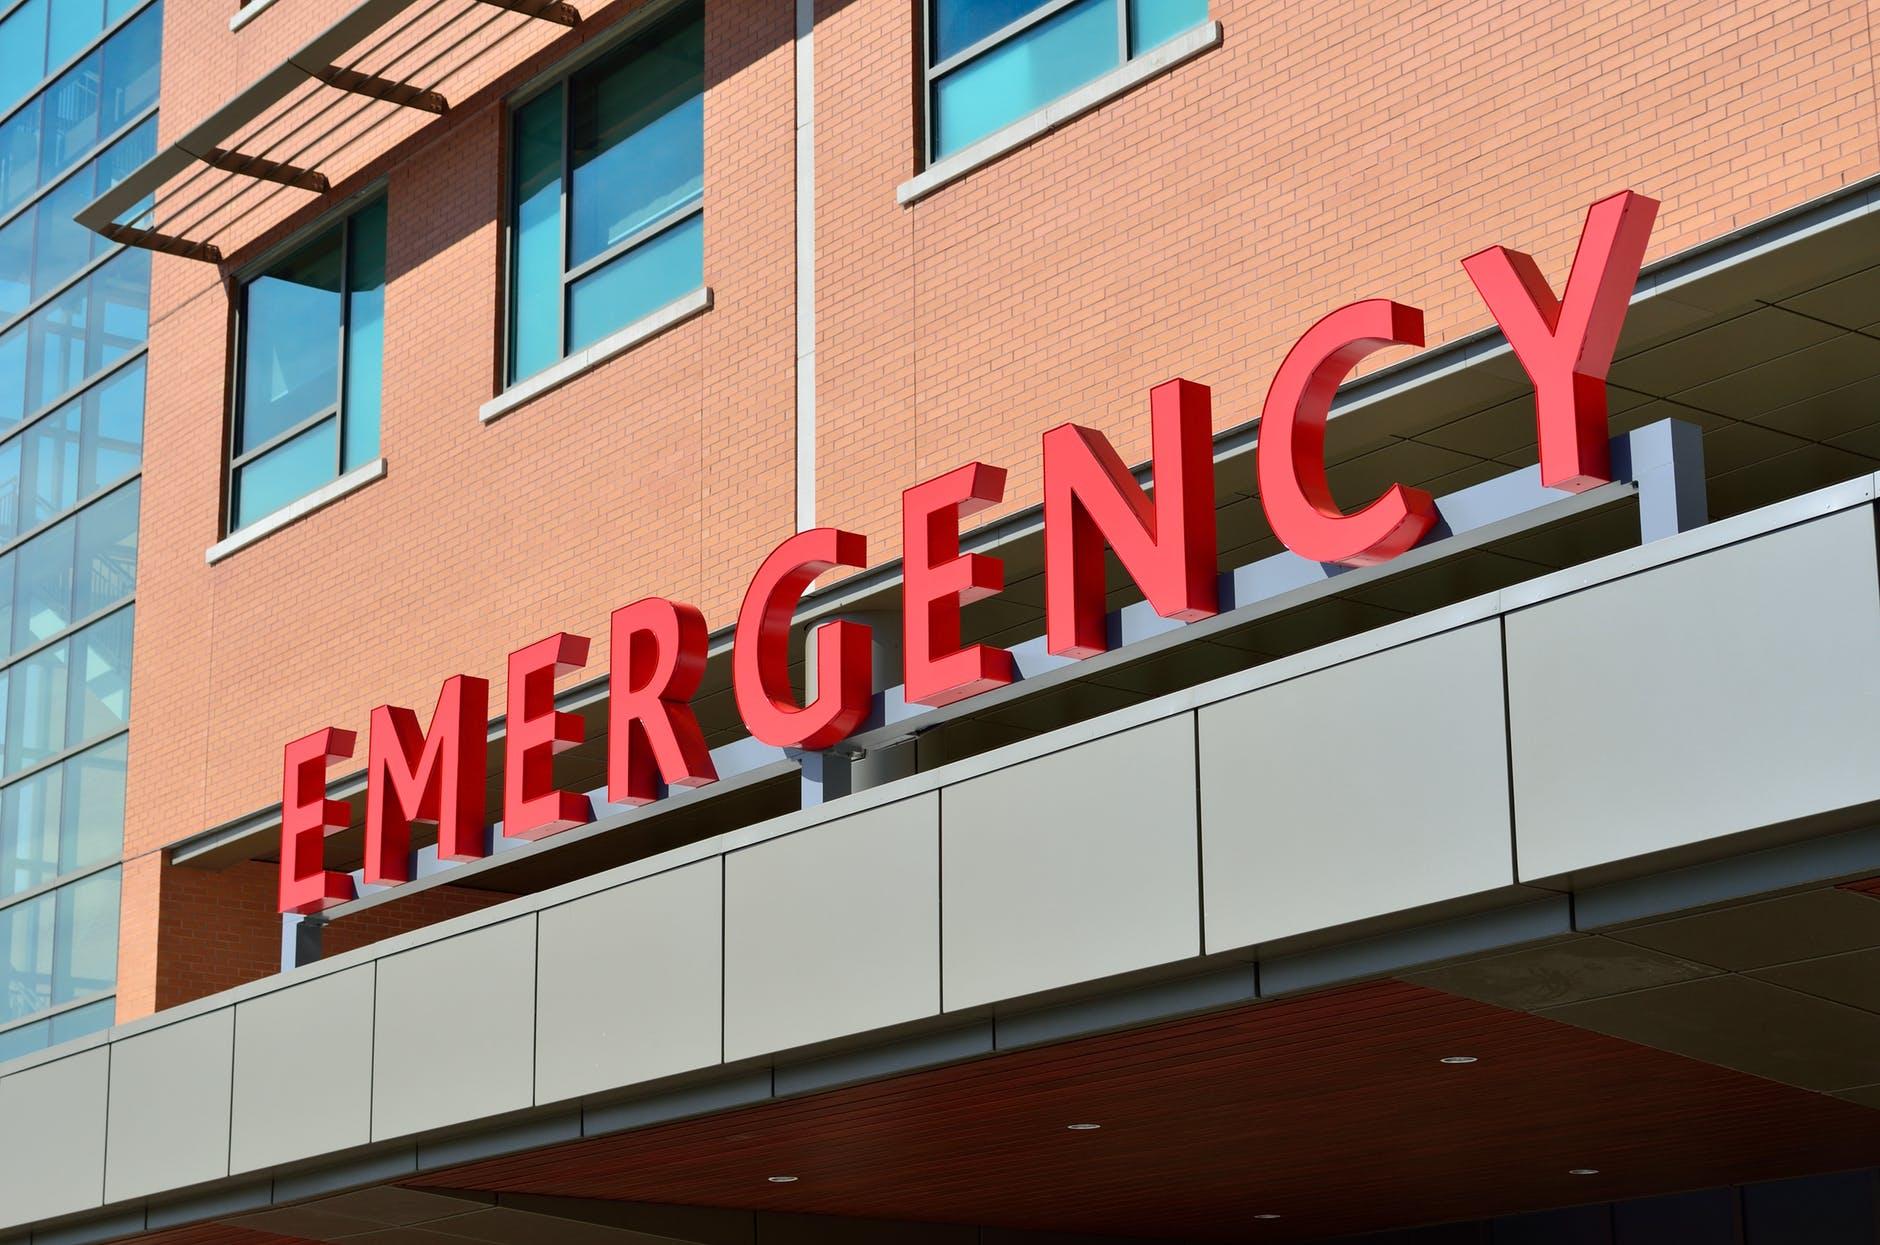 hospital, first responder, emergency room, 911